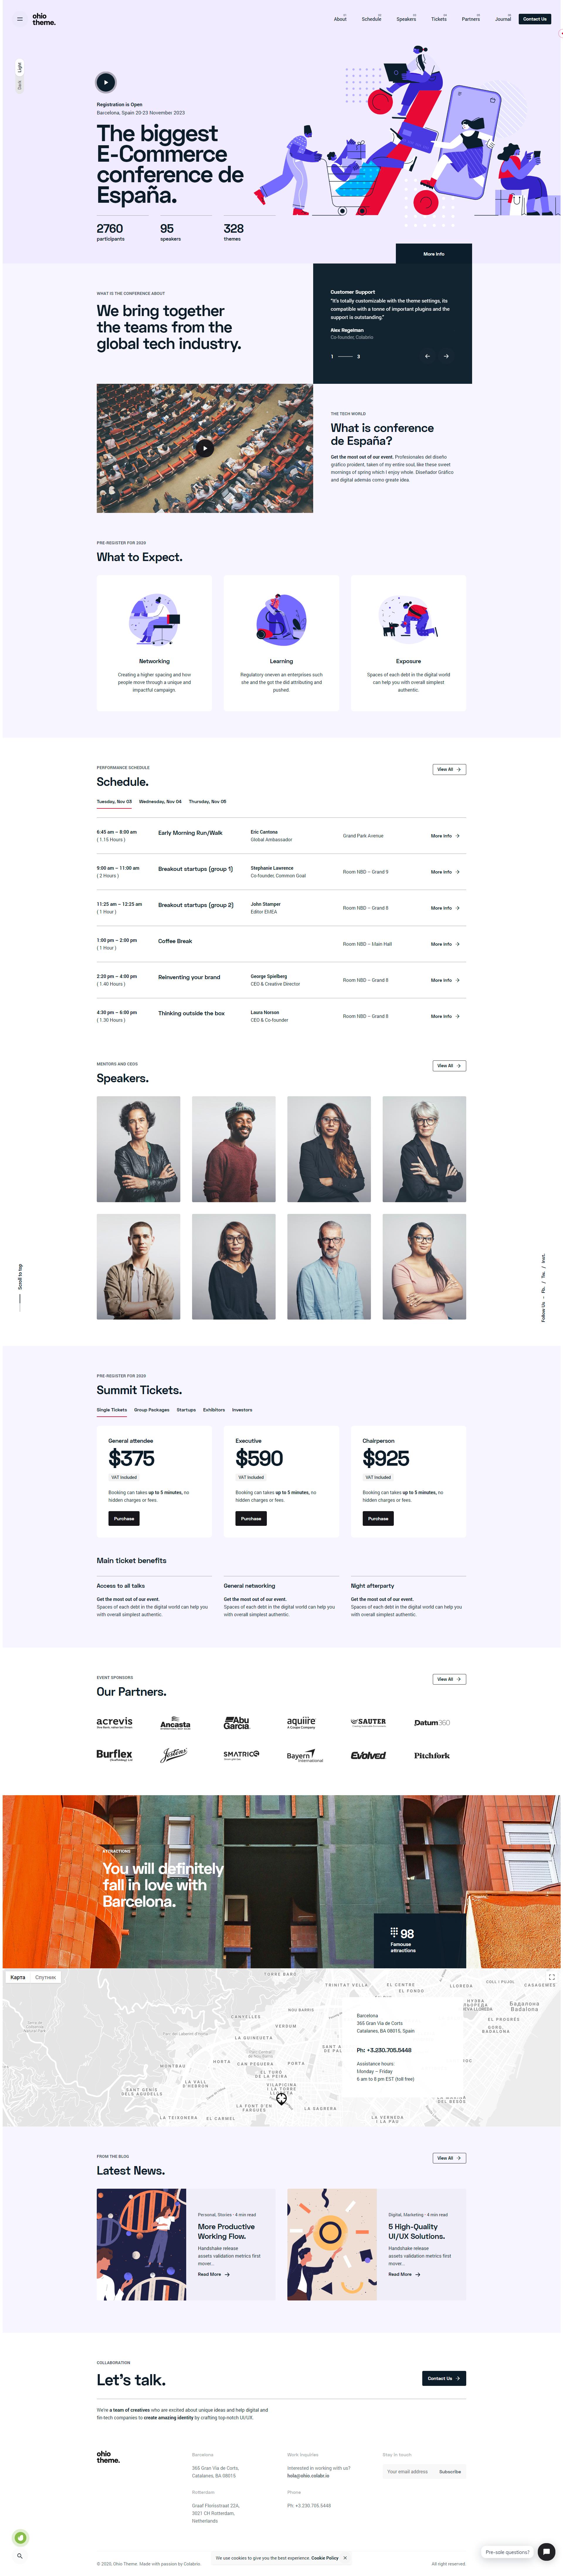 Ohio Creative Portfolio Agency Wordpress Theme Stylelib In 2020 Creative Portfolio Web Design Inspiration Web Design